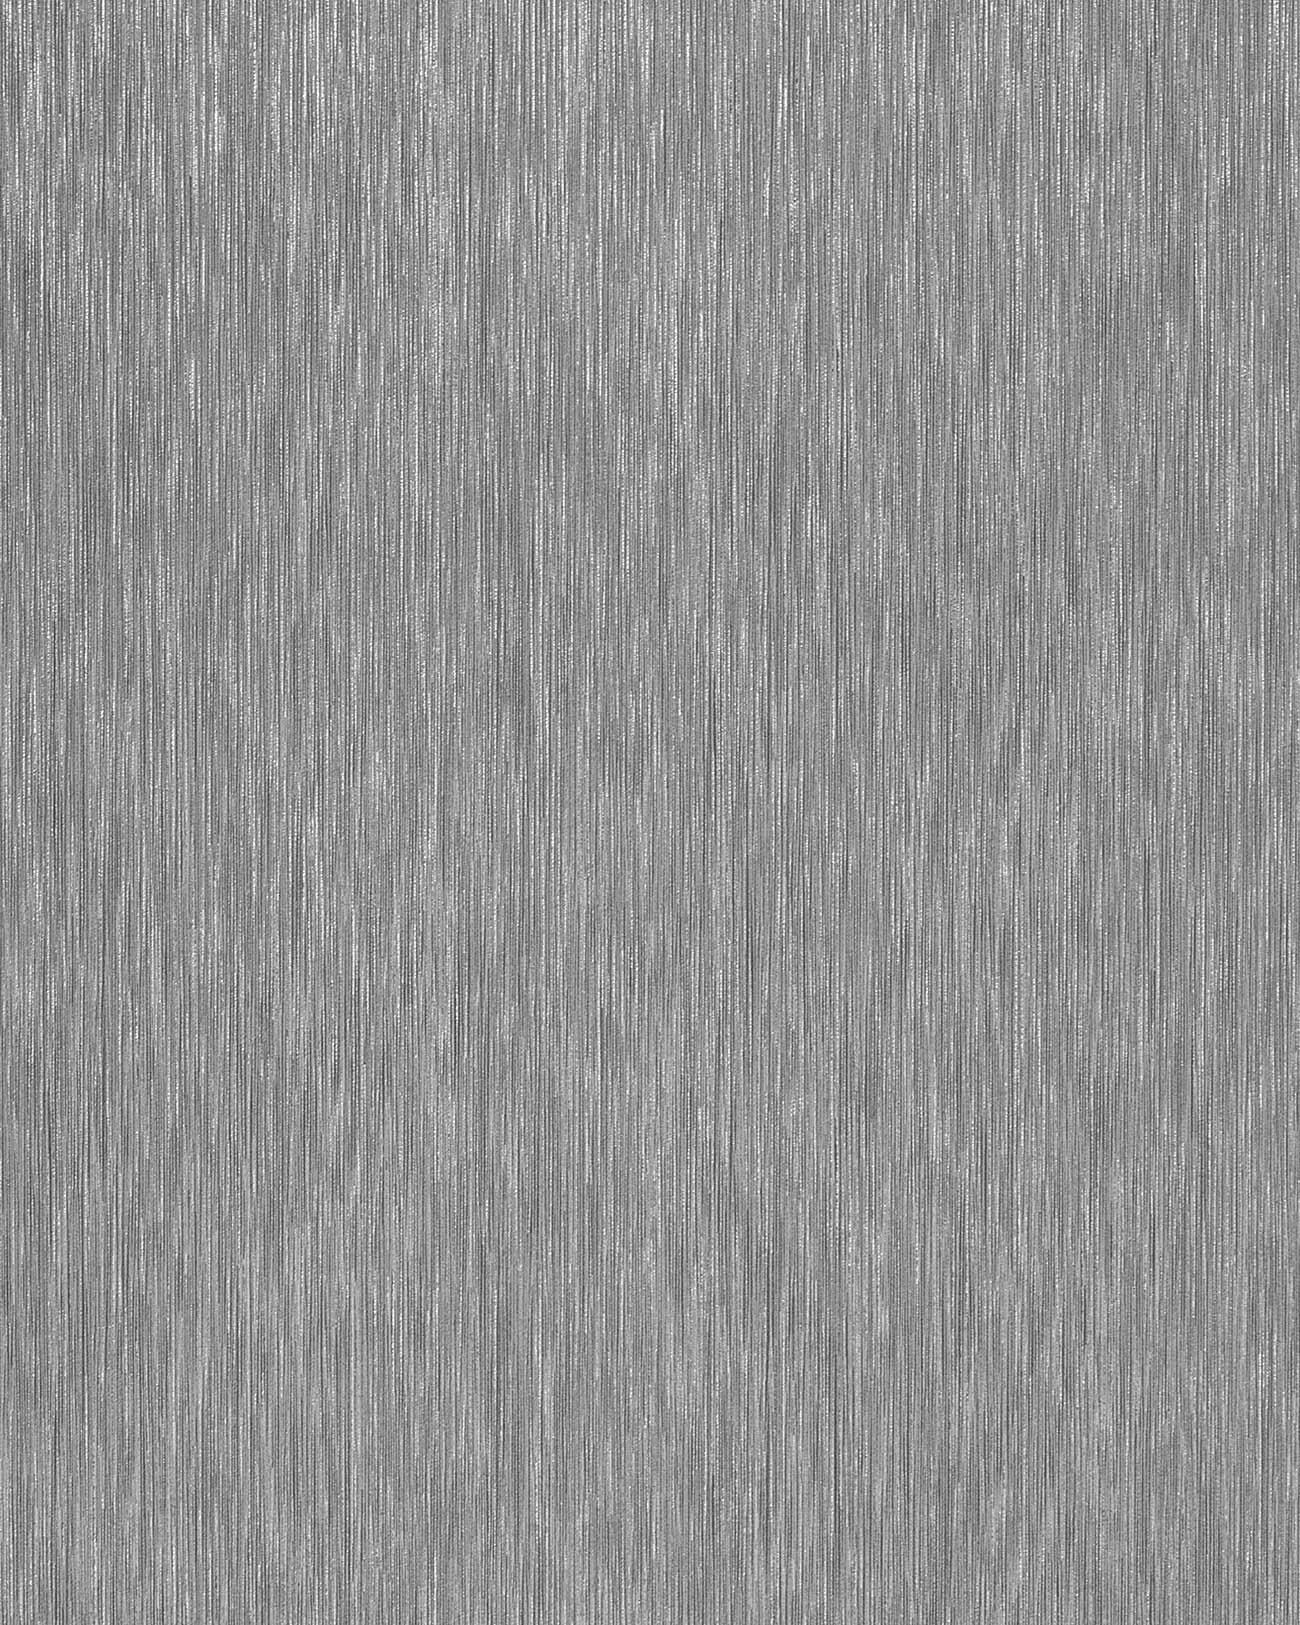 Tapeten Mit Metallic Effekt : mit Metallic Look und Glanzeffekten – Wallpapers & Wallcoverings buy